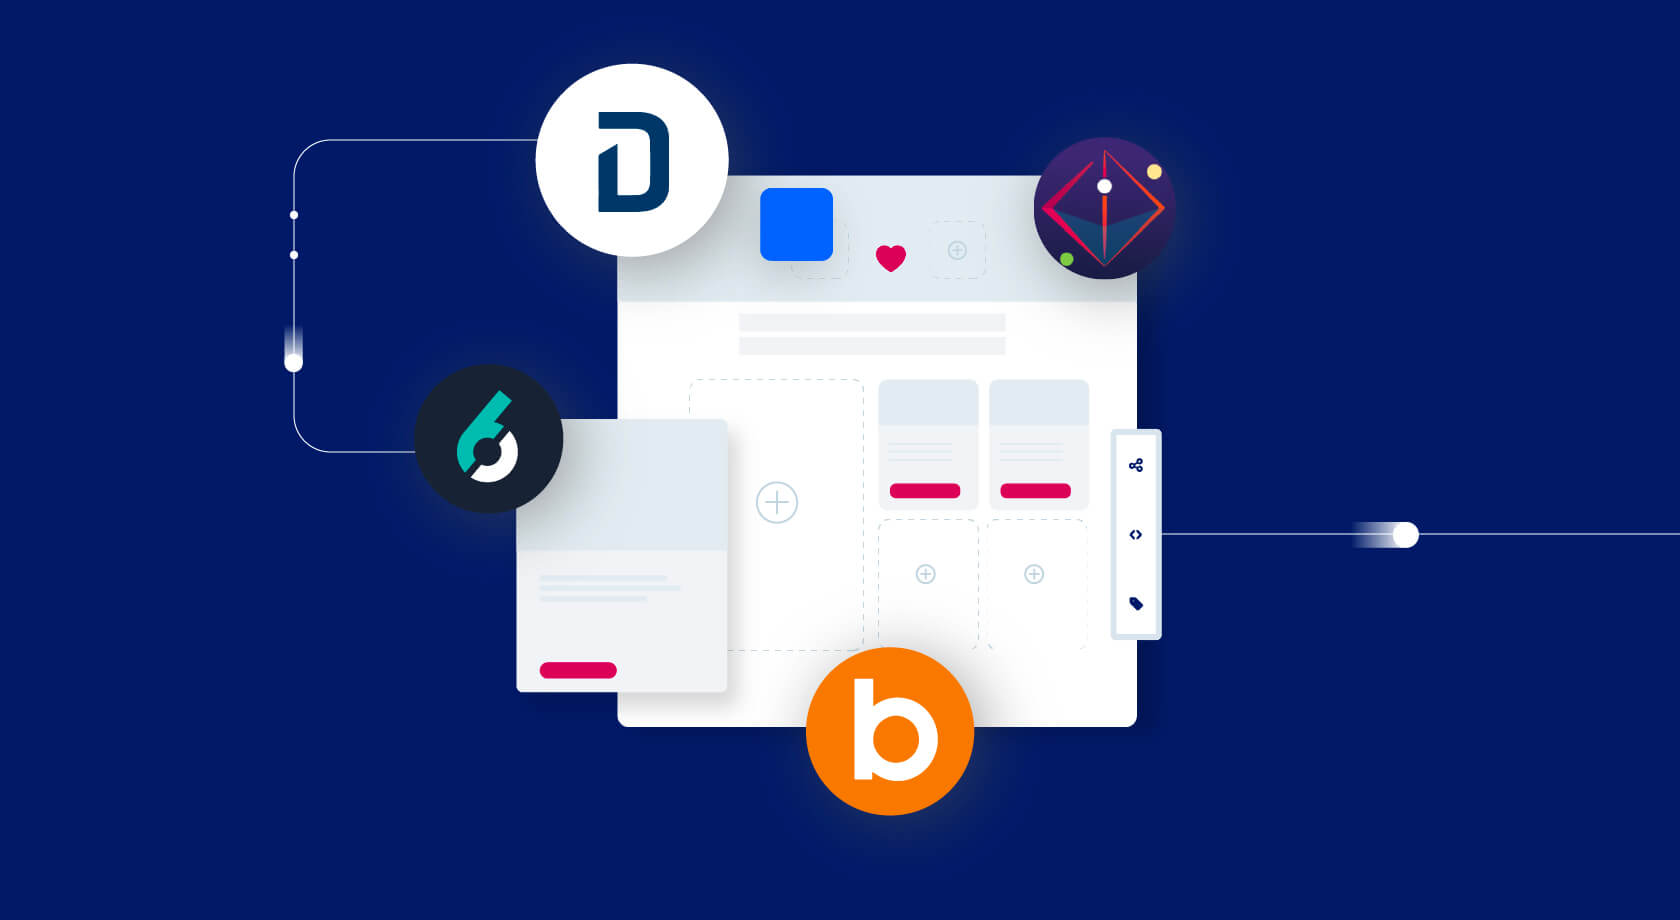 Illustration of various technologies plugging into the Uberflip platform